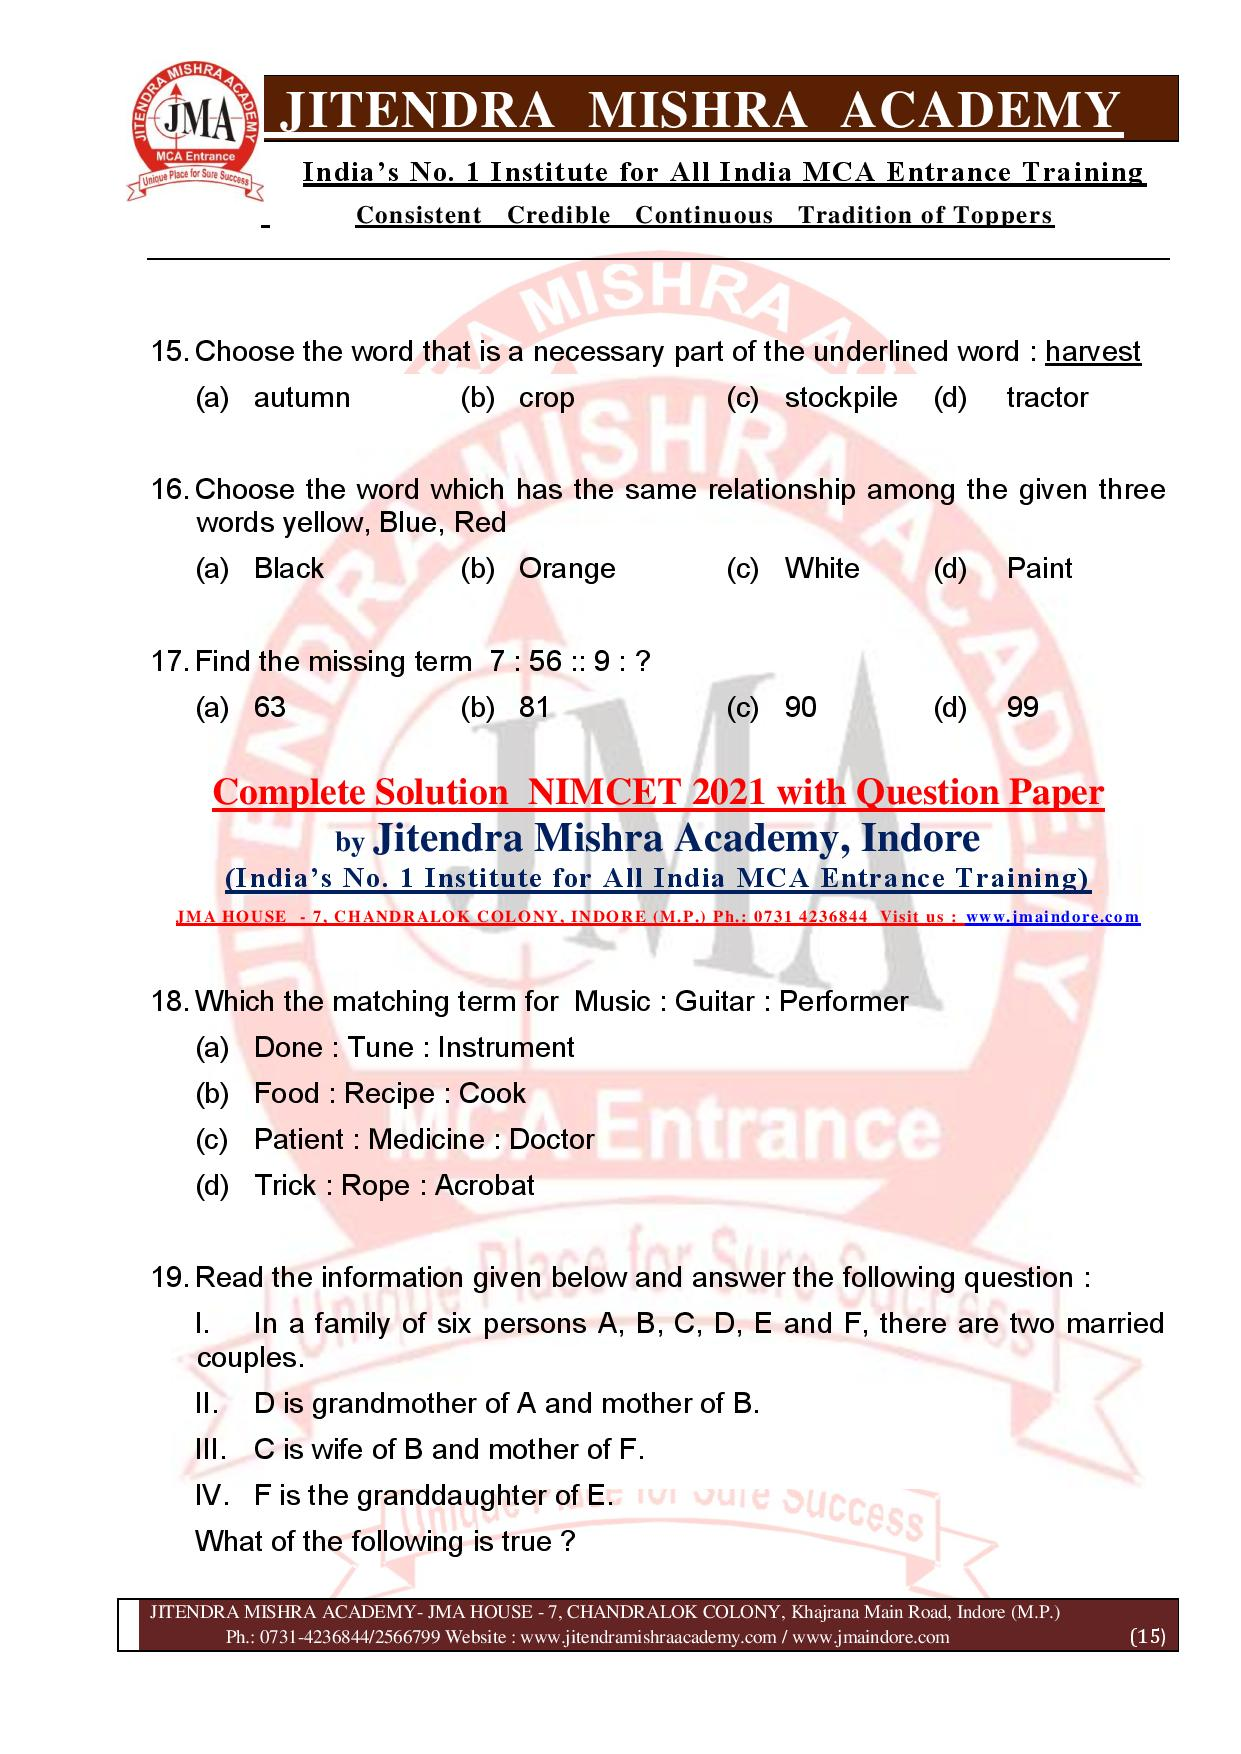 NIMCET 2021 QUESTION PAPER (F)-page-015